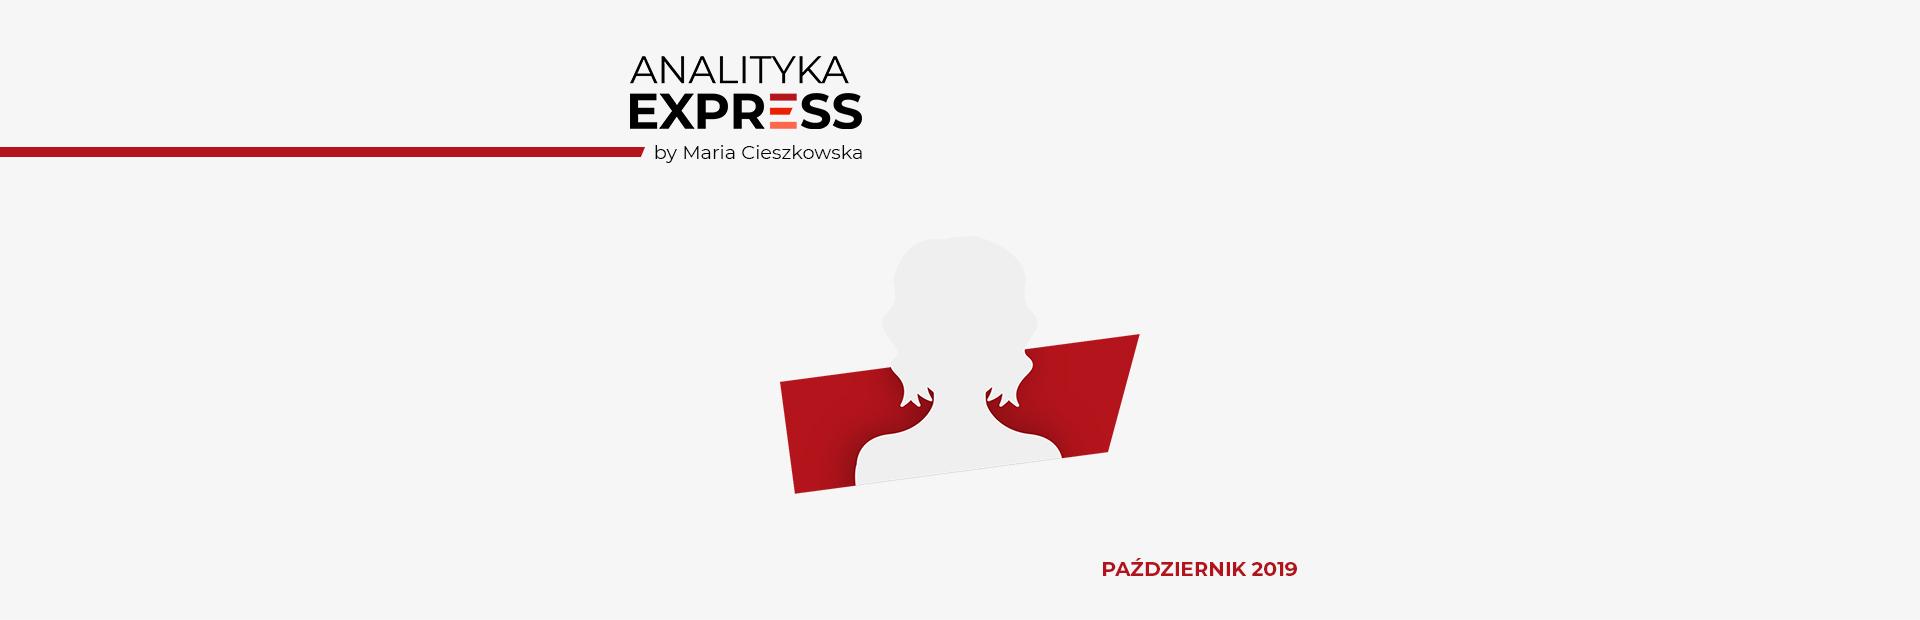 Analityka express